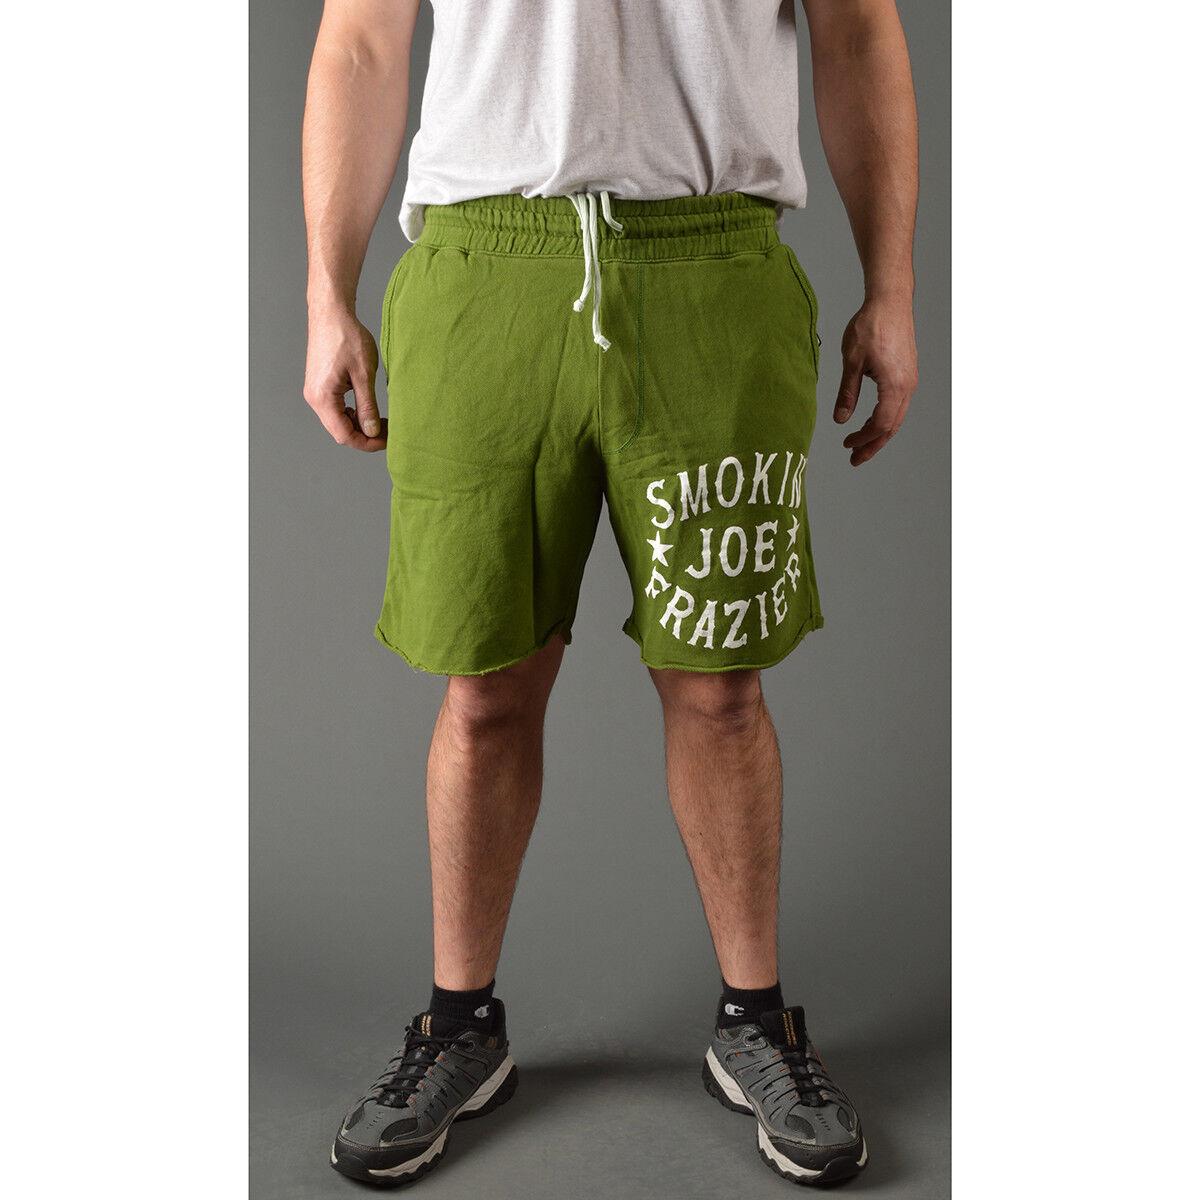 Roots of Fight Smokin' Joe Frazier Slim Fit Shorts - Green